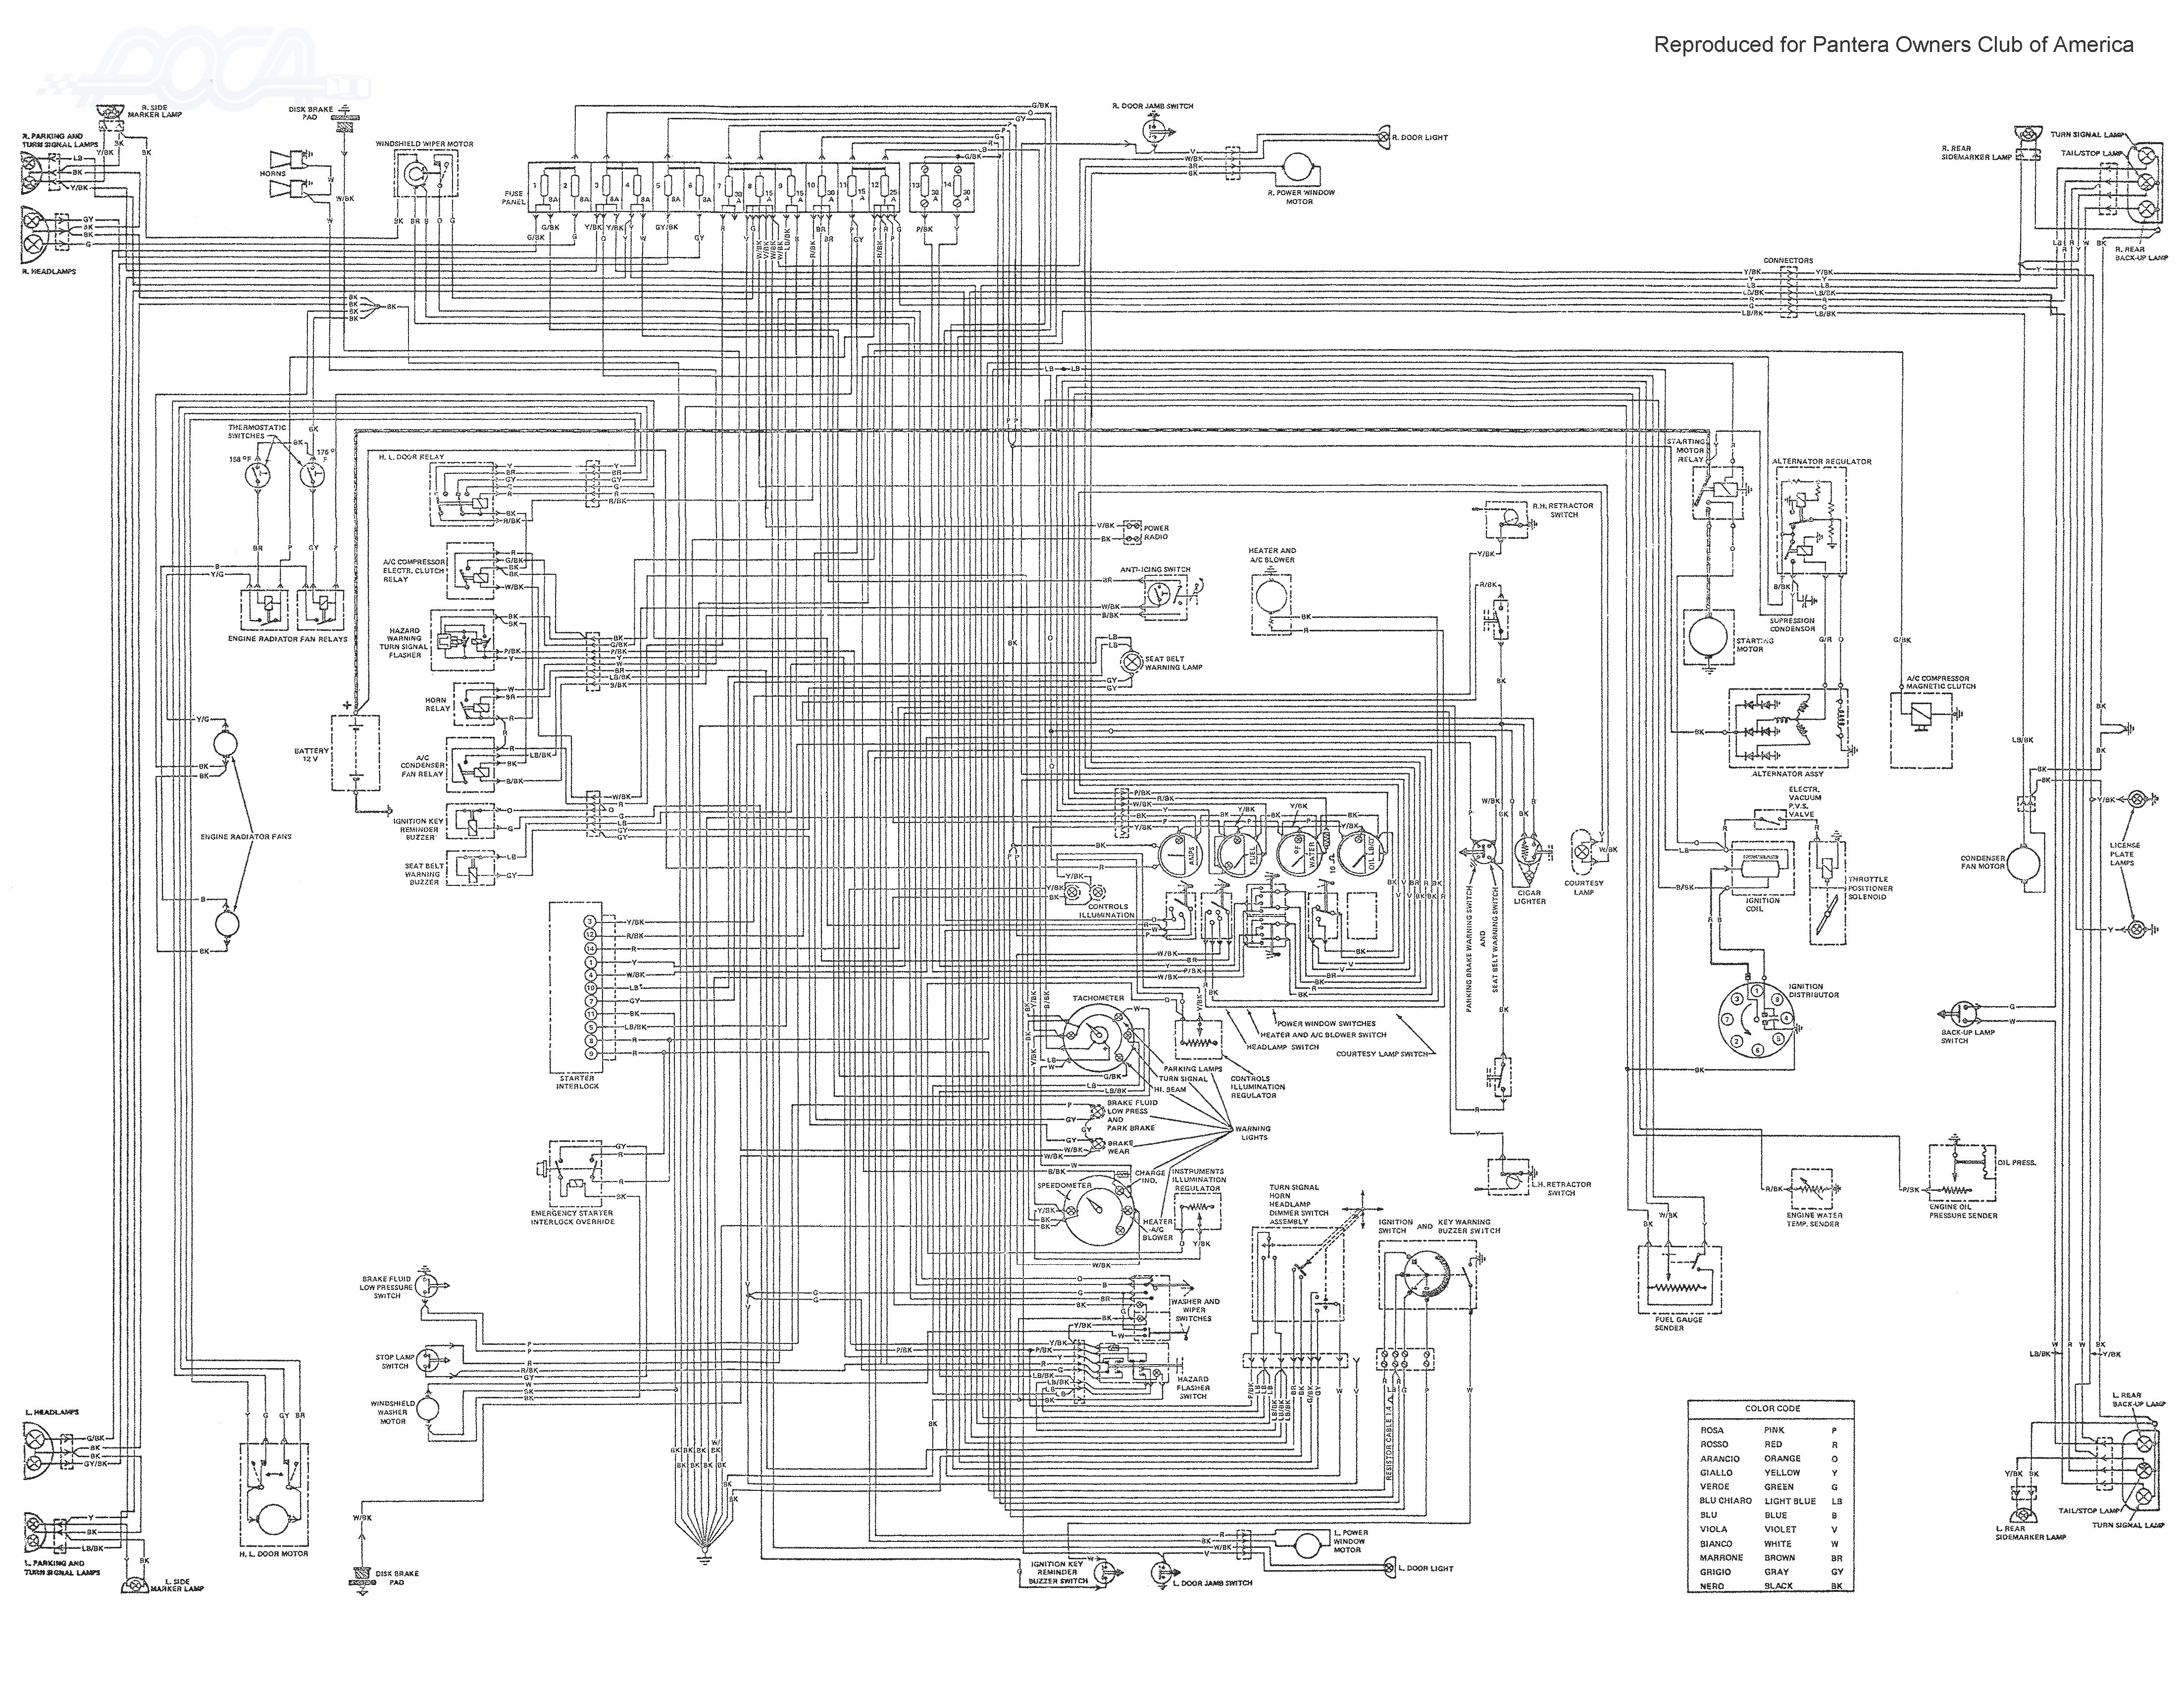 1999 Freightliner Fl70 Fuse Diagram 2008 Honda Cr V Exterior Fuse Box Rccar Wiring Mbek1 Operazionerestauro It